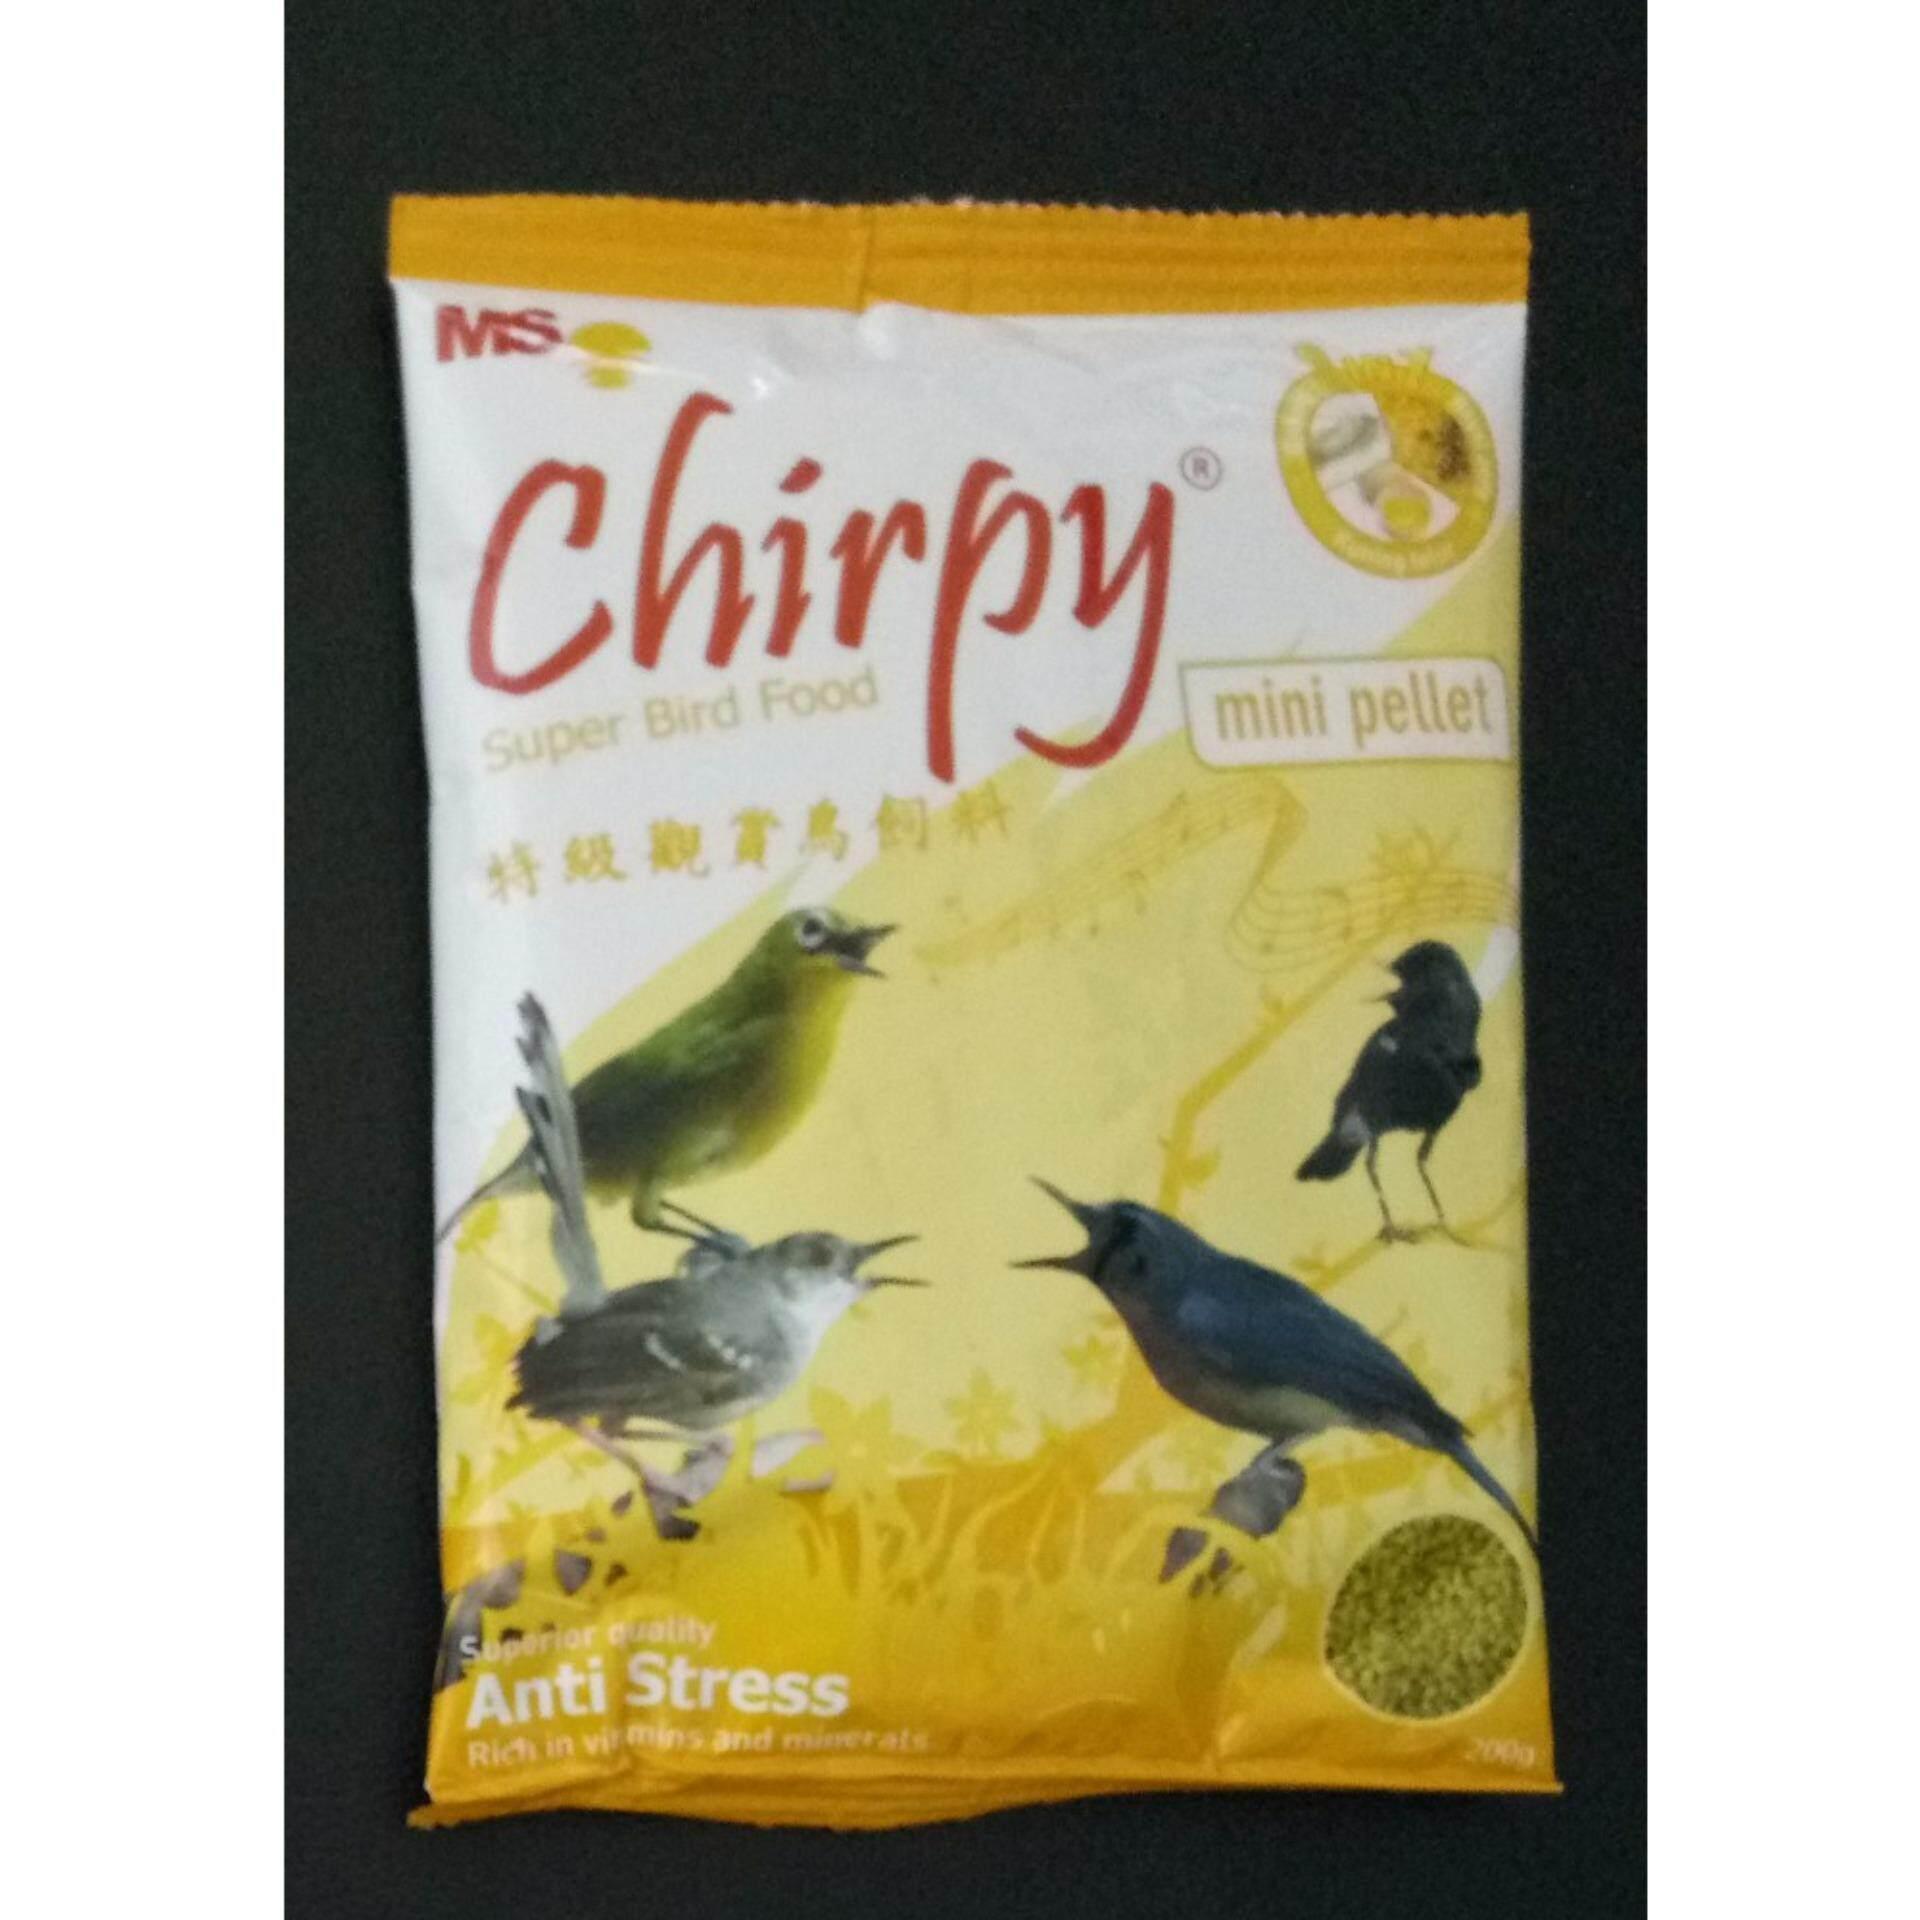 SUPER BIRD FOOD CHIRPY GINSENG 3 IN 1 MINI PALLET (200g) x 2bag